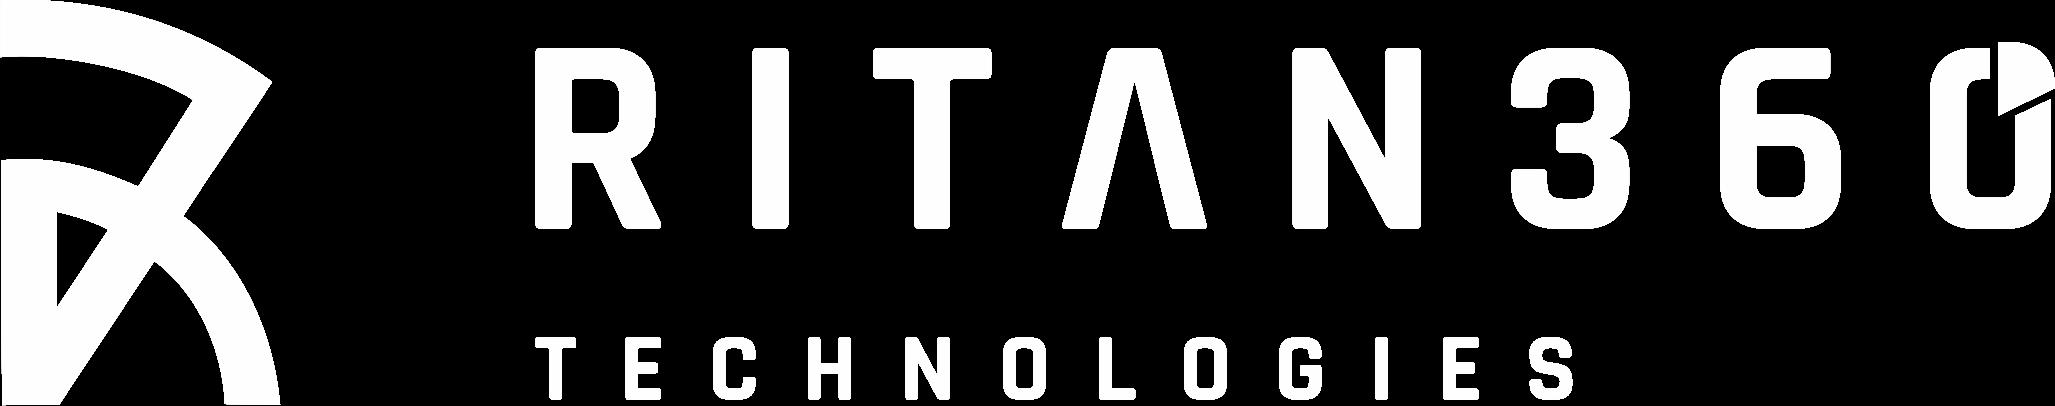 Digital Marketing & Website Design Company in Lagos, Nigeria - Ritan360 Technologies